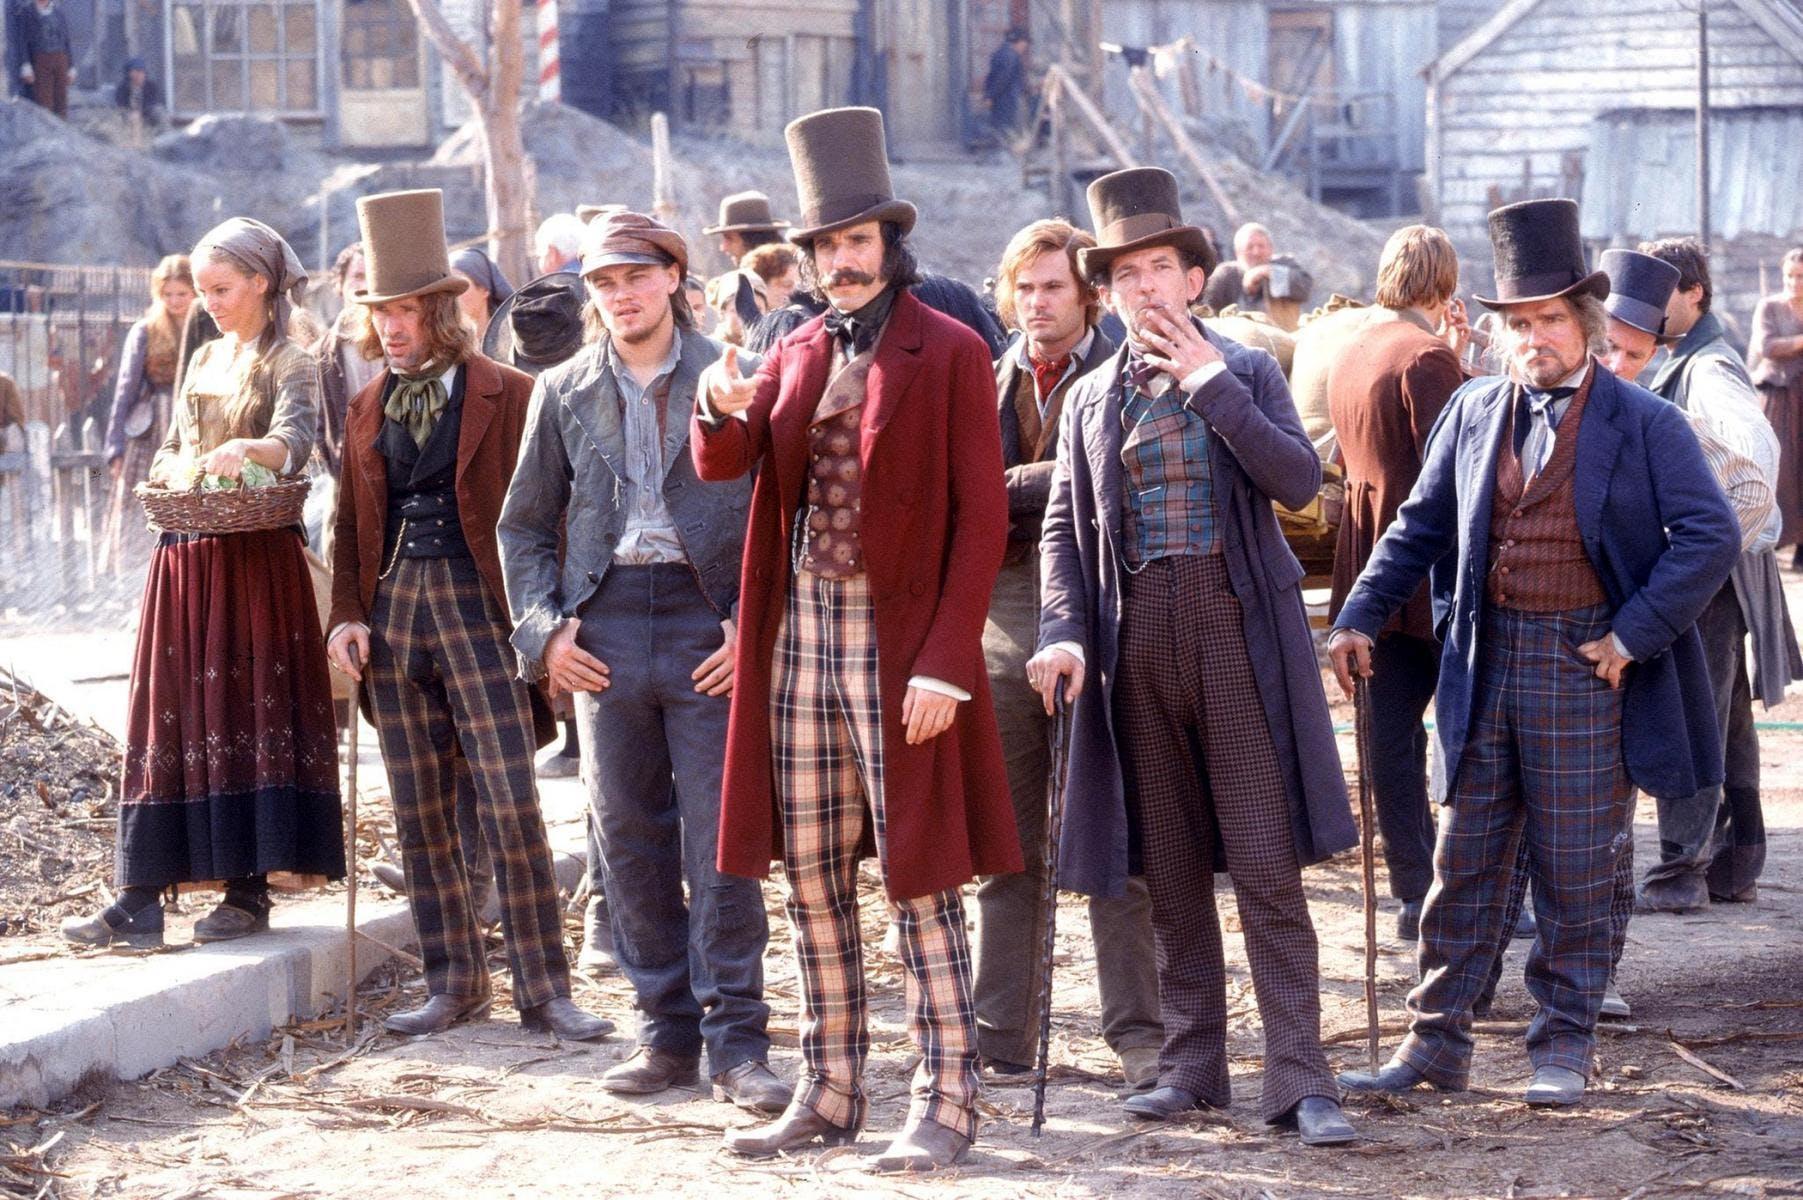 Martin Scorsese: Gangs of New York